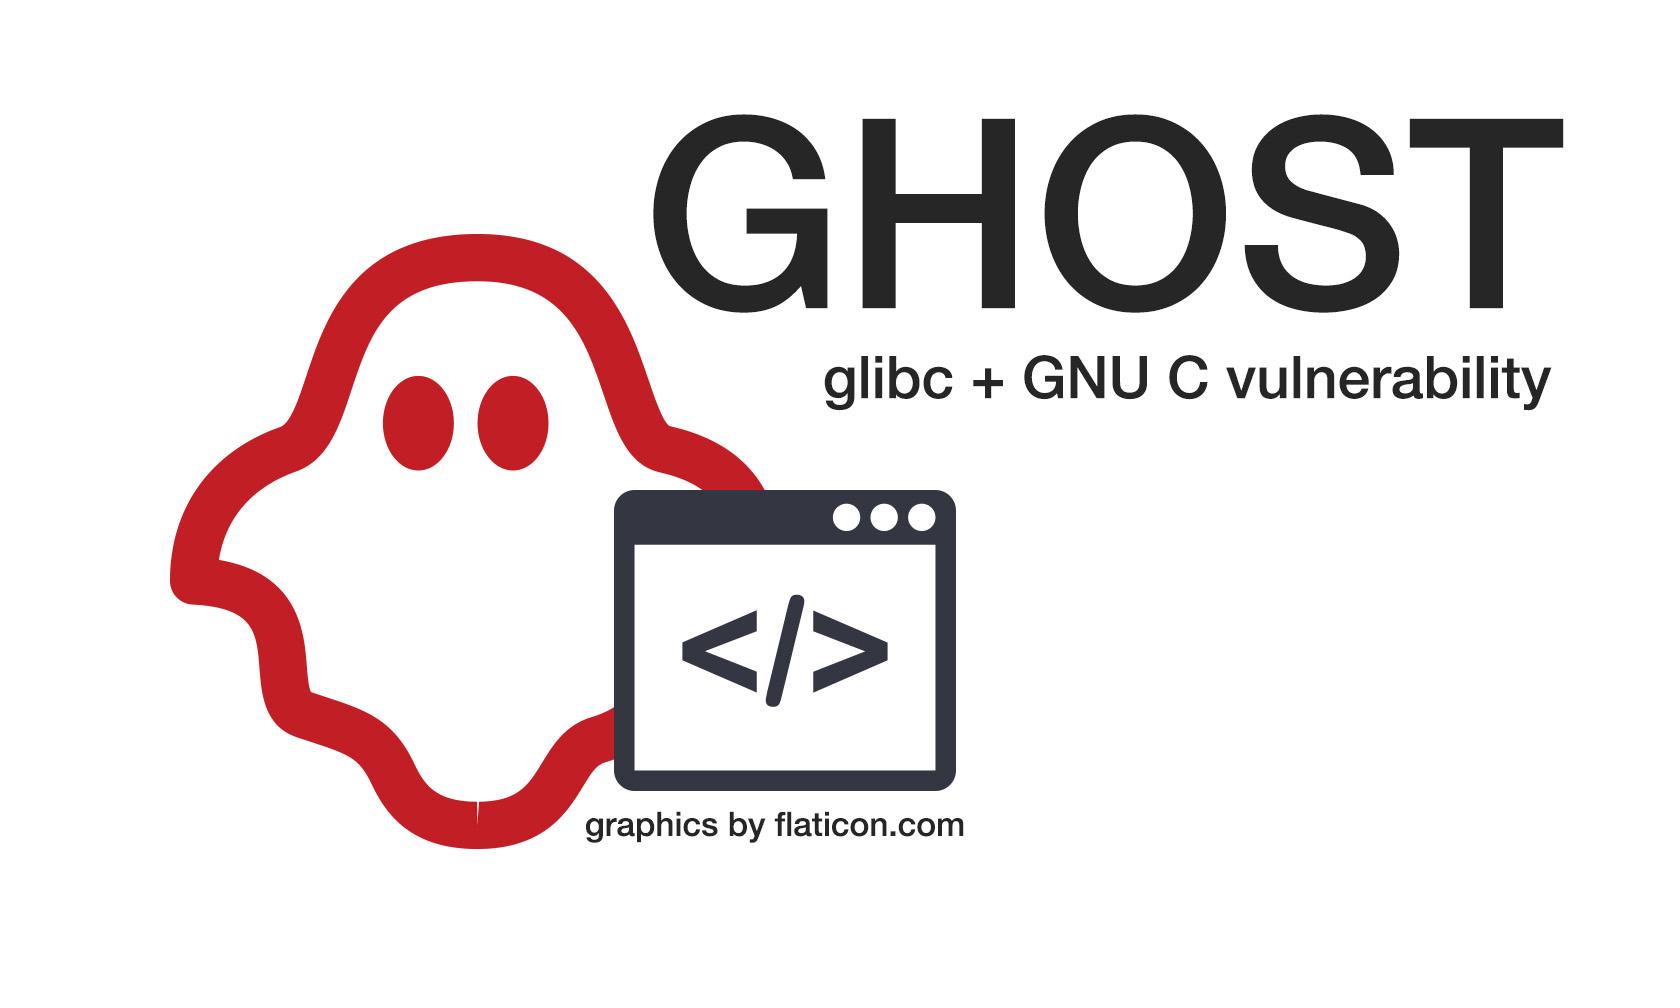 GHOST server vulnerability